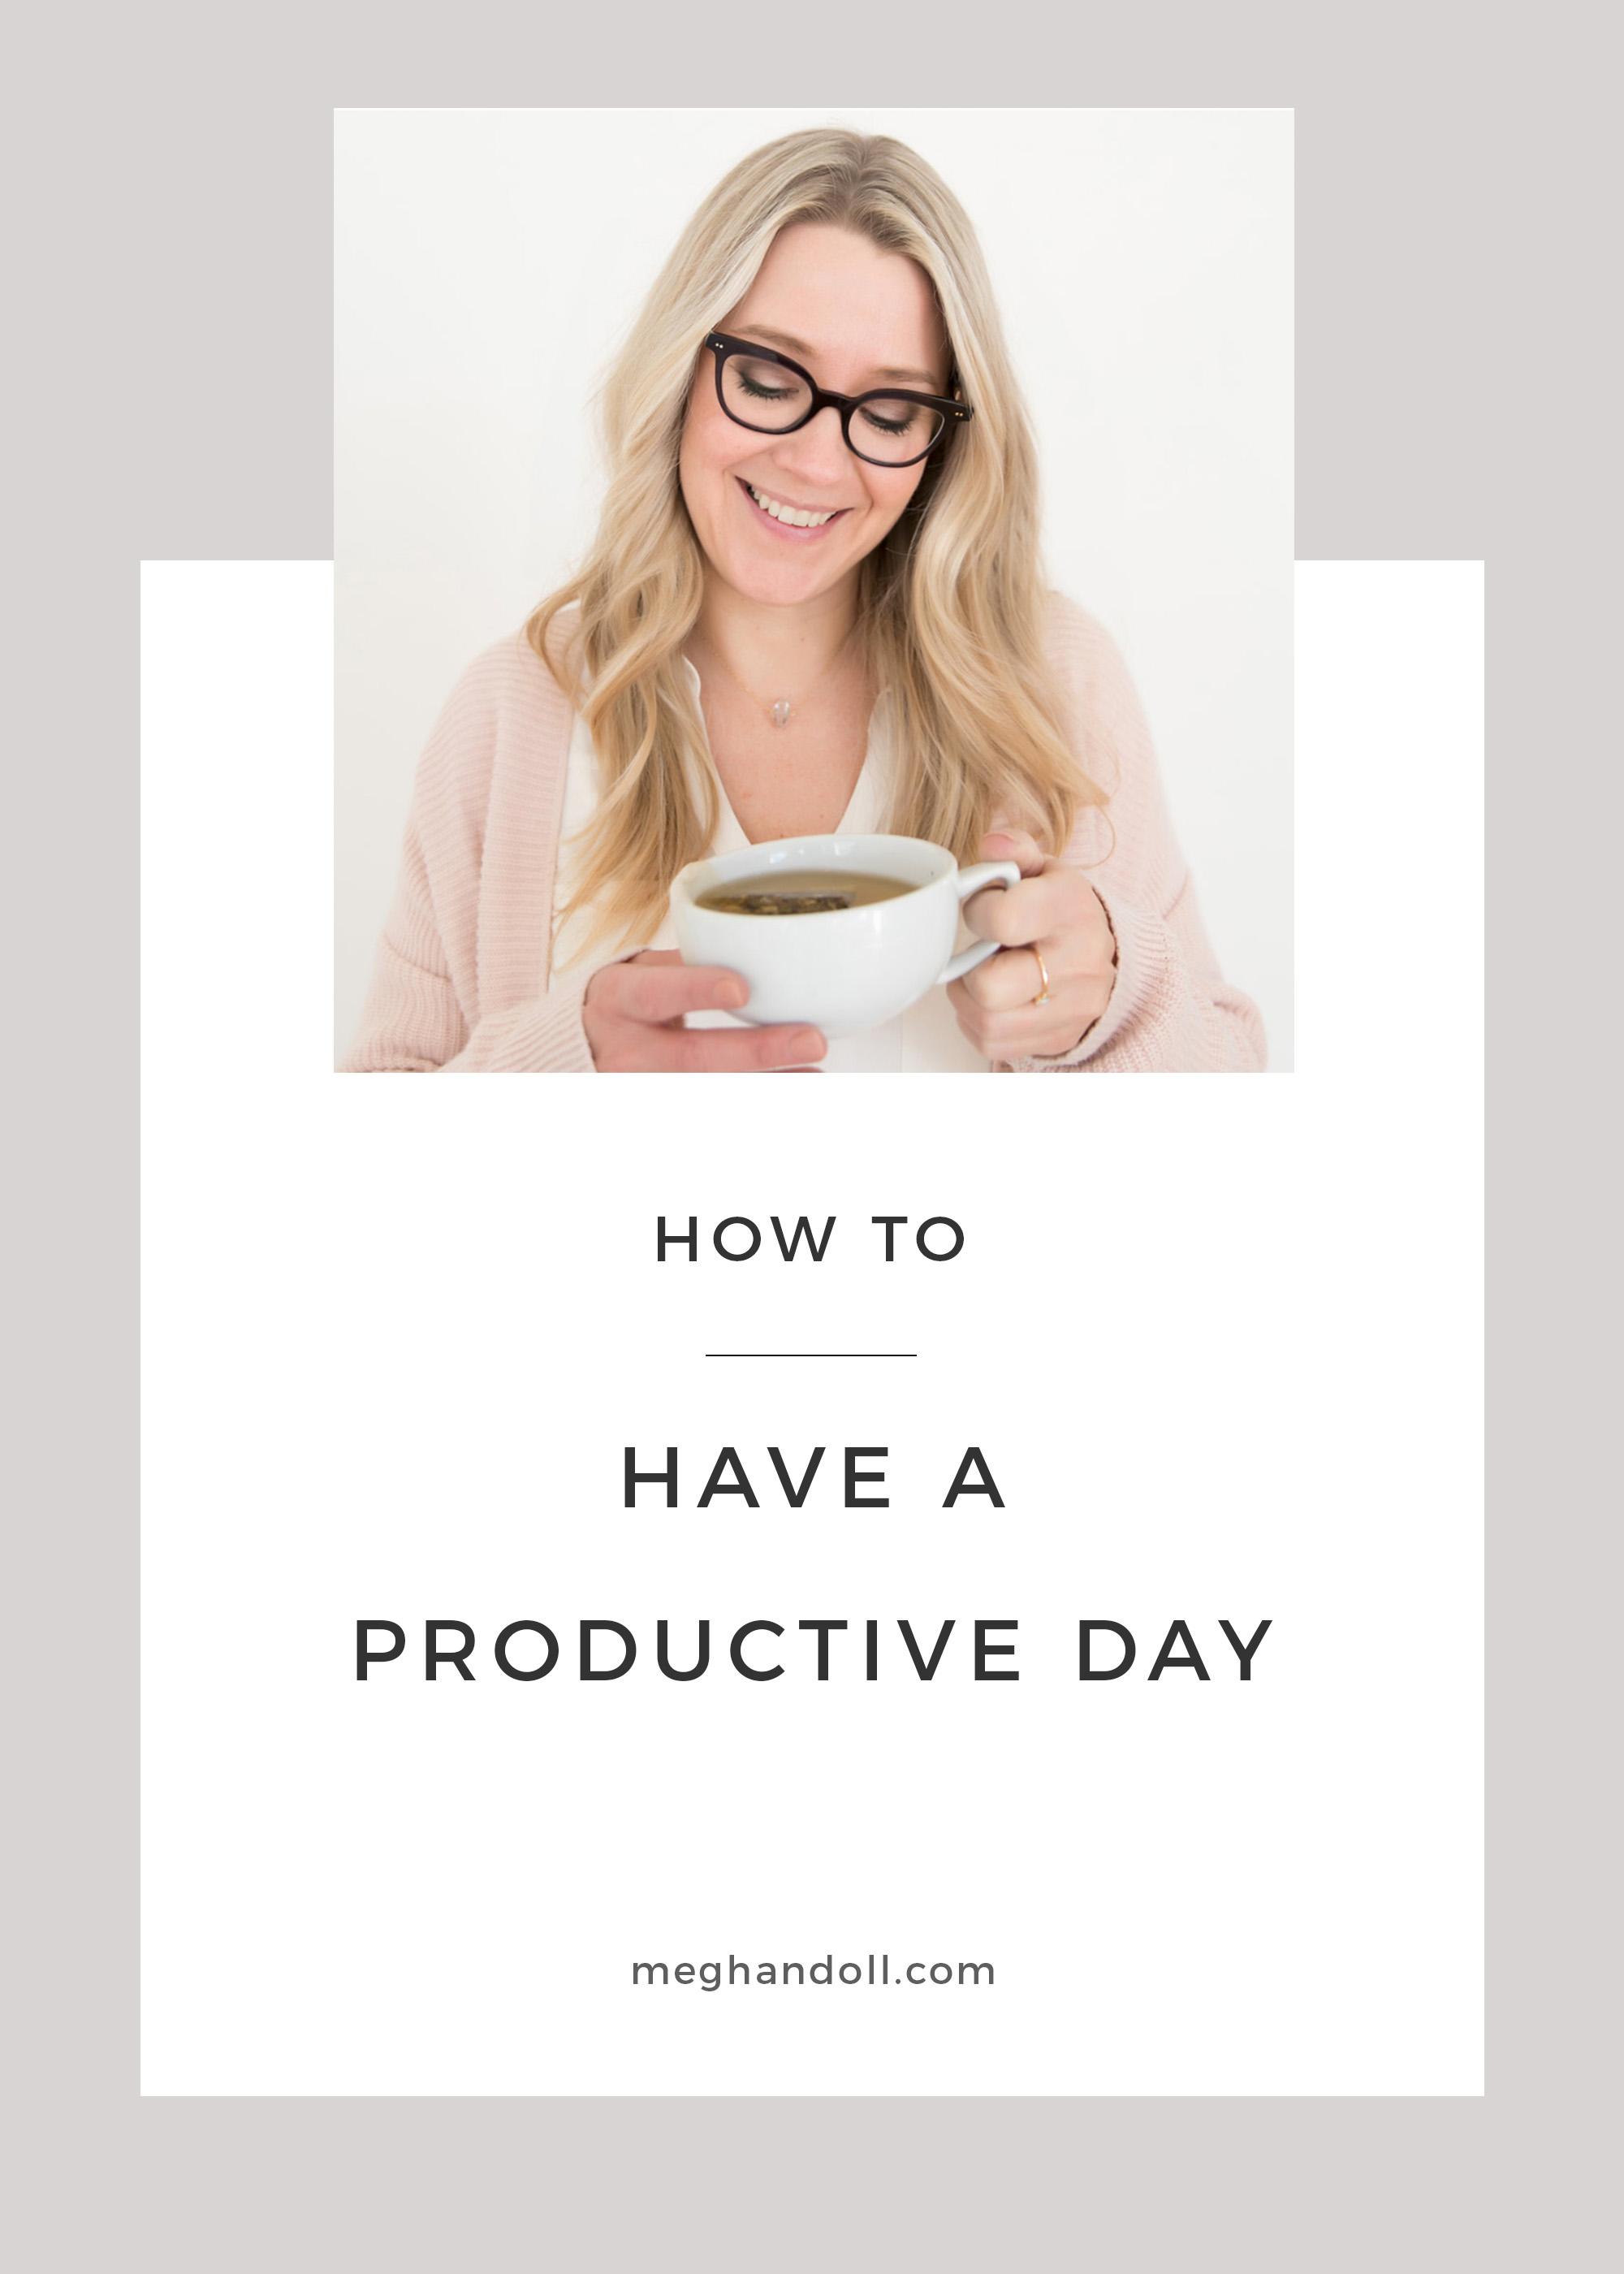 productiveday.jpg